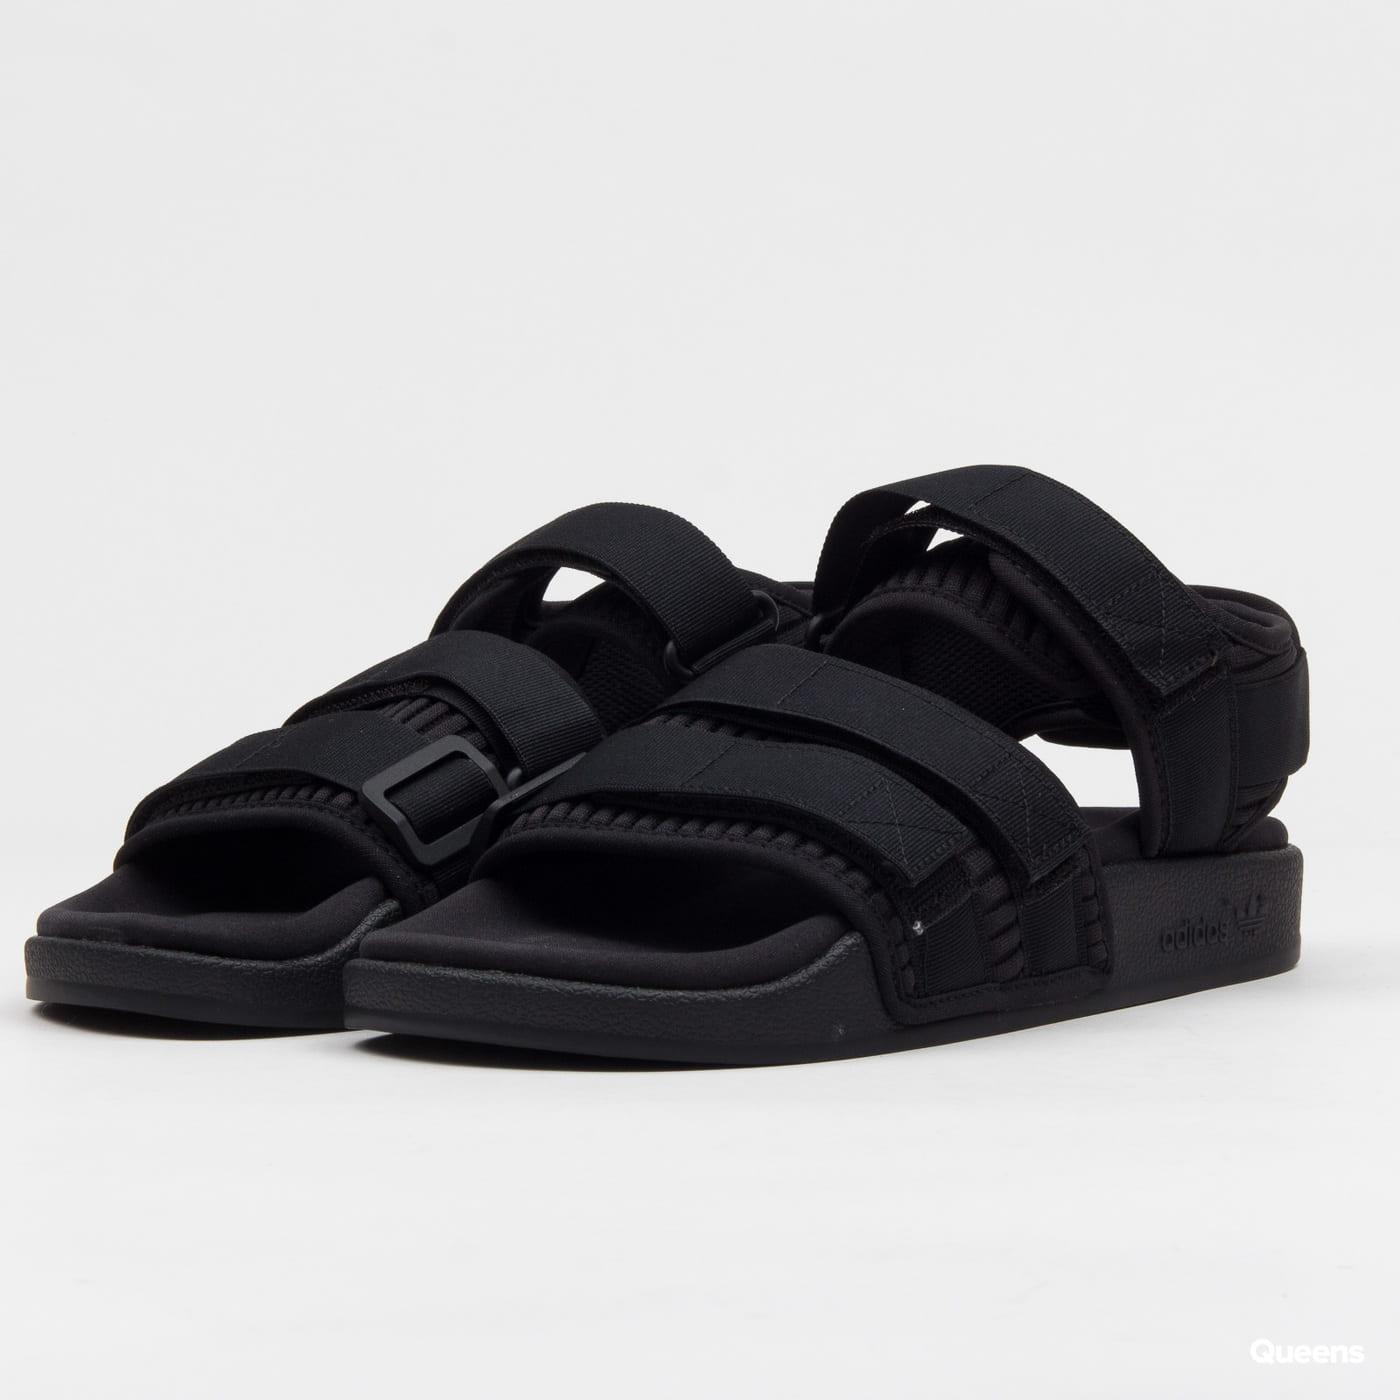 sports shoes ff9a0 8c5b5 Sandals adidas Originals Adilette Sandal 2.0 W (CG6623)– Queens 💚